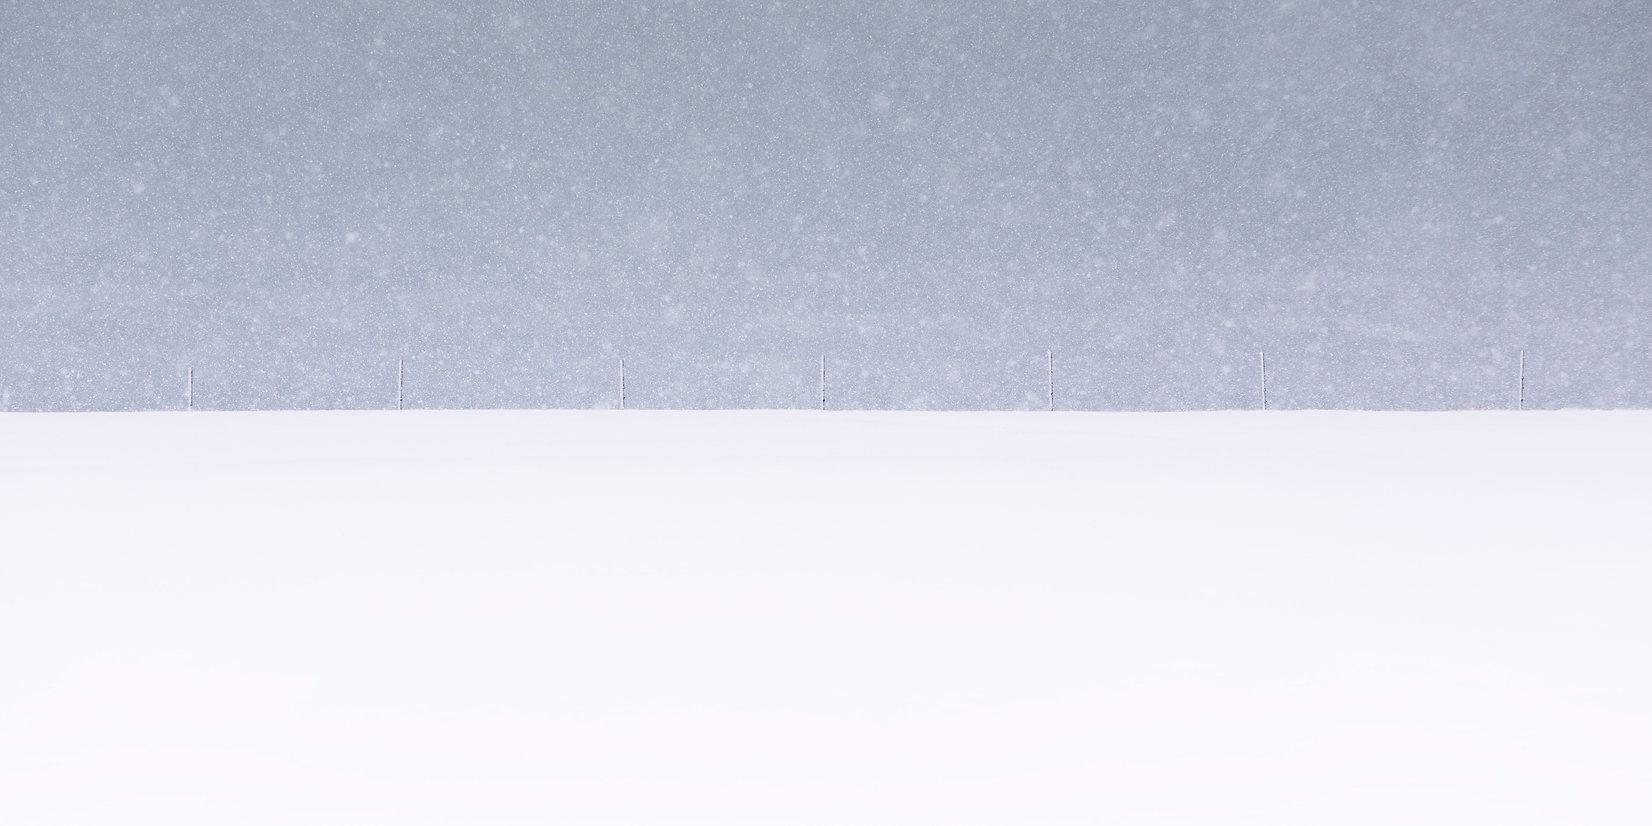 Snow_posts_lofoten_pano.jpg